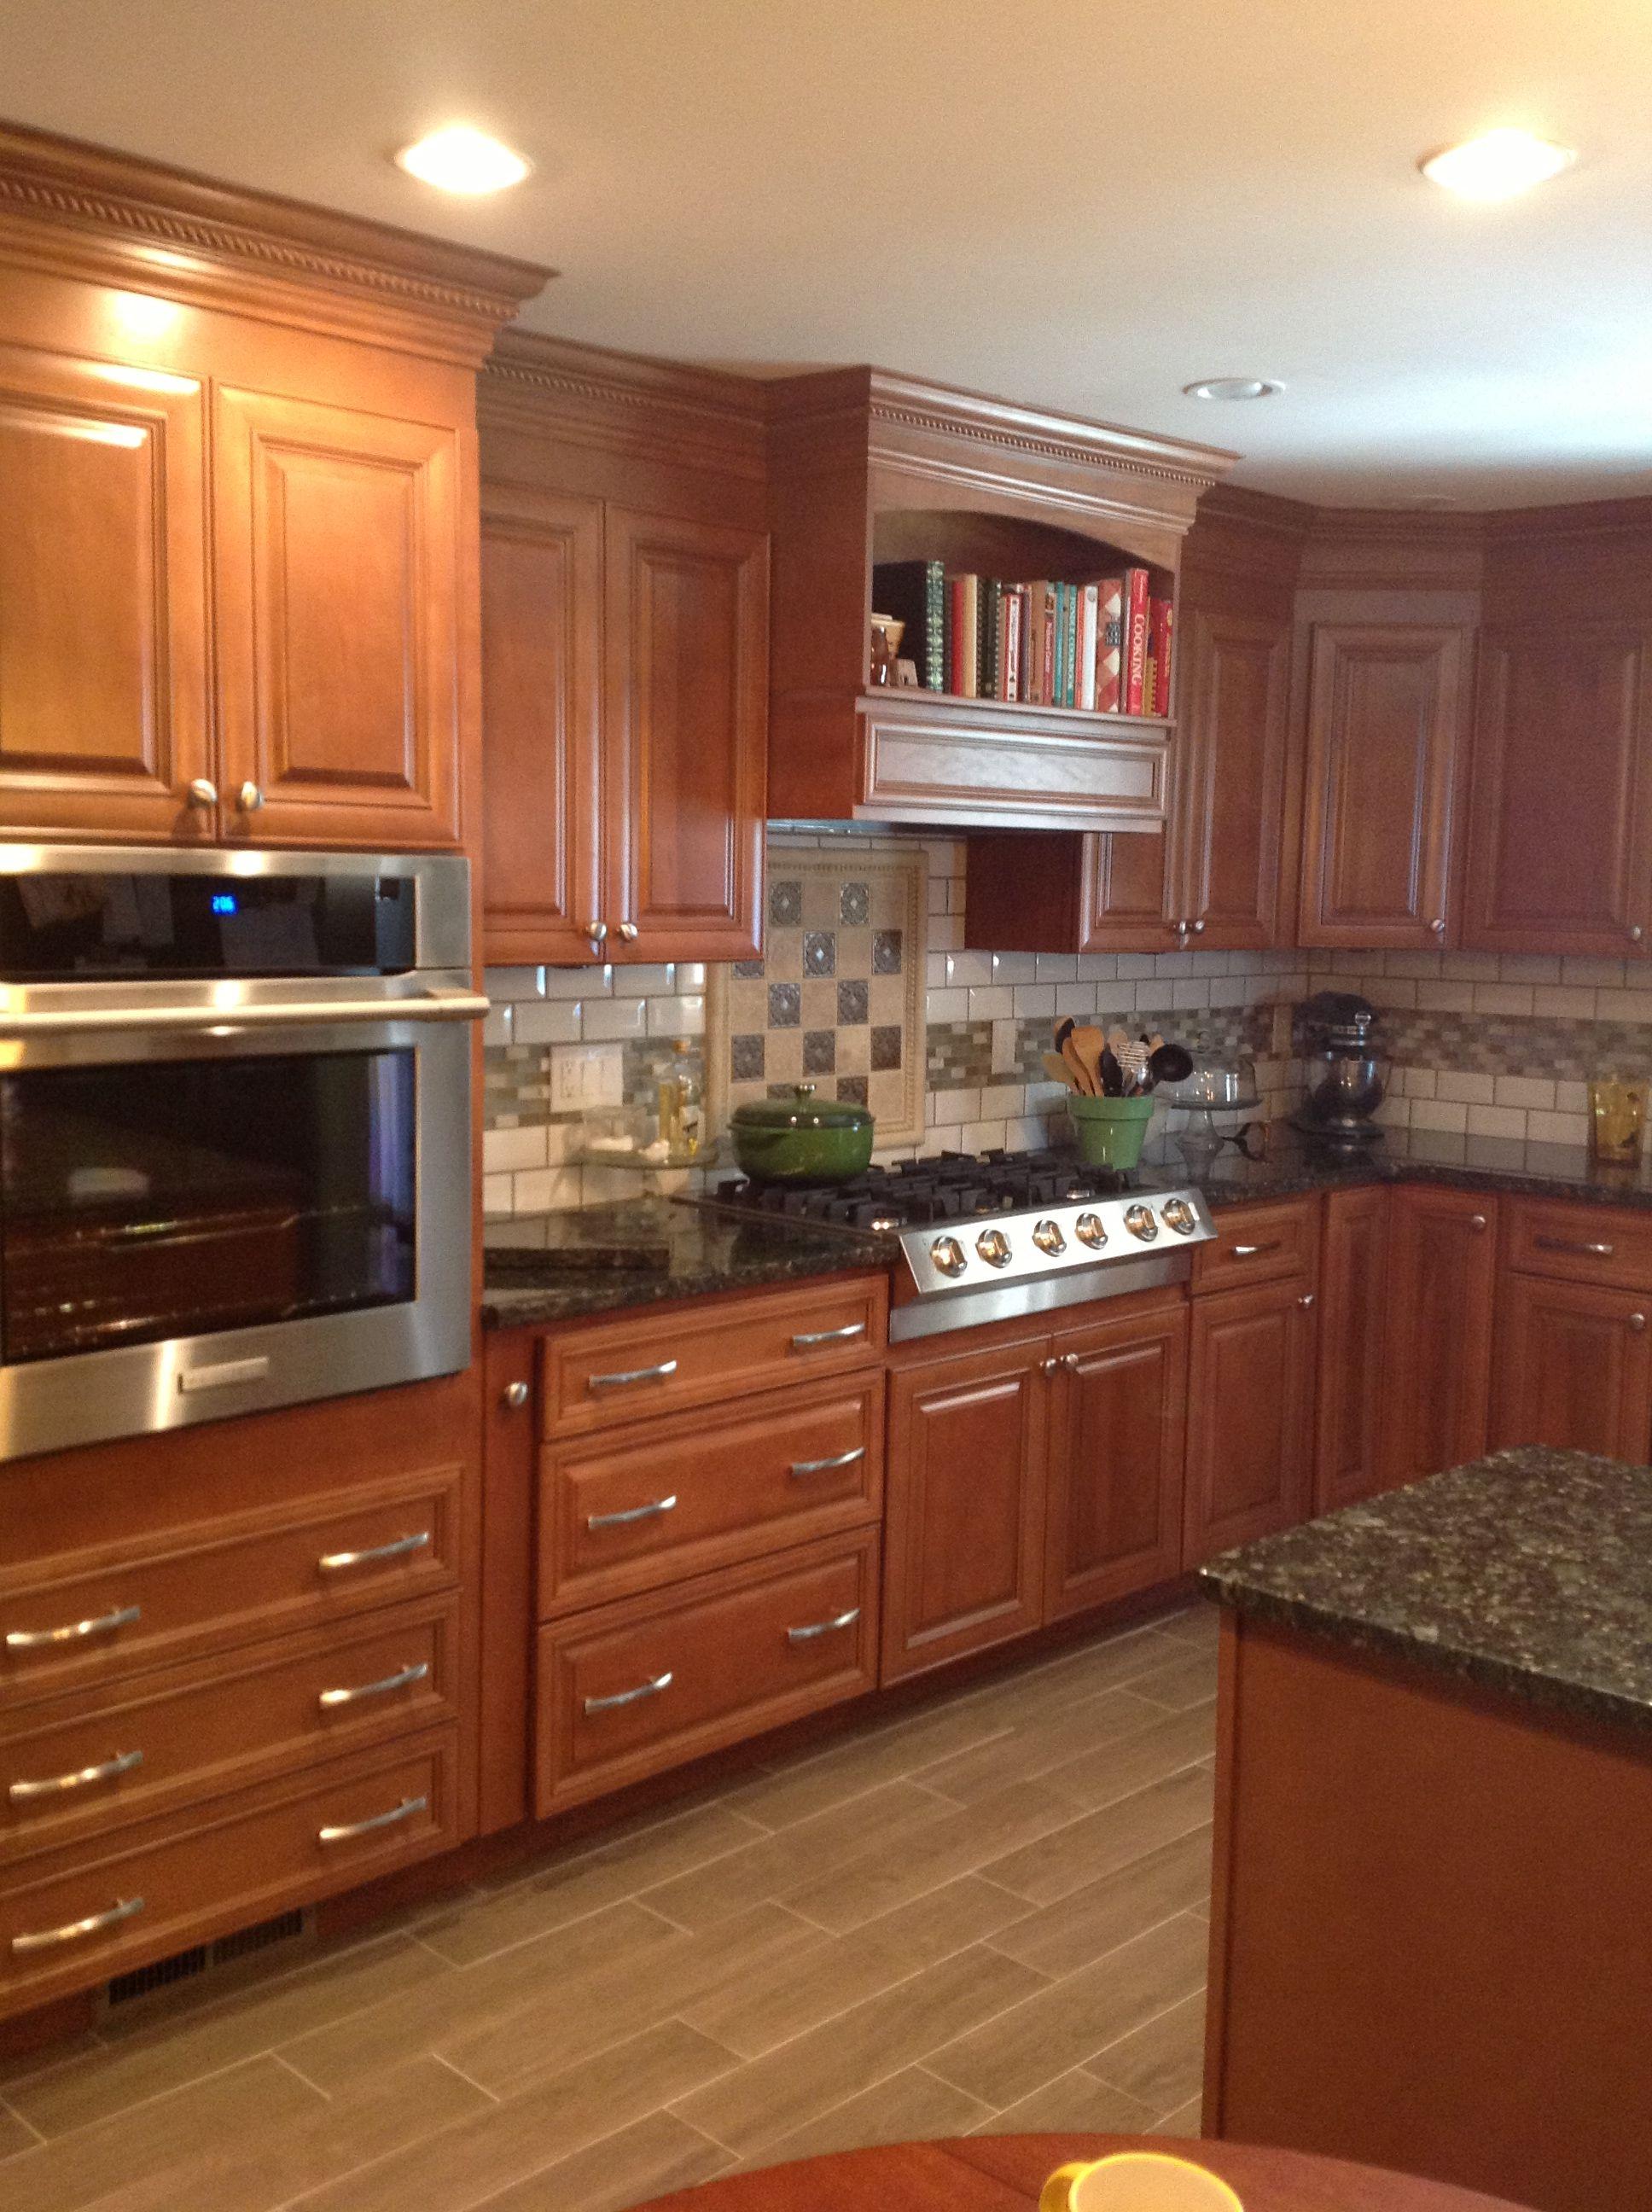 Kitchen Verde Erfly Granite Book Shelf Backsplash With Subway Tile